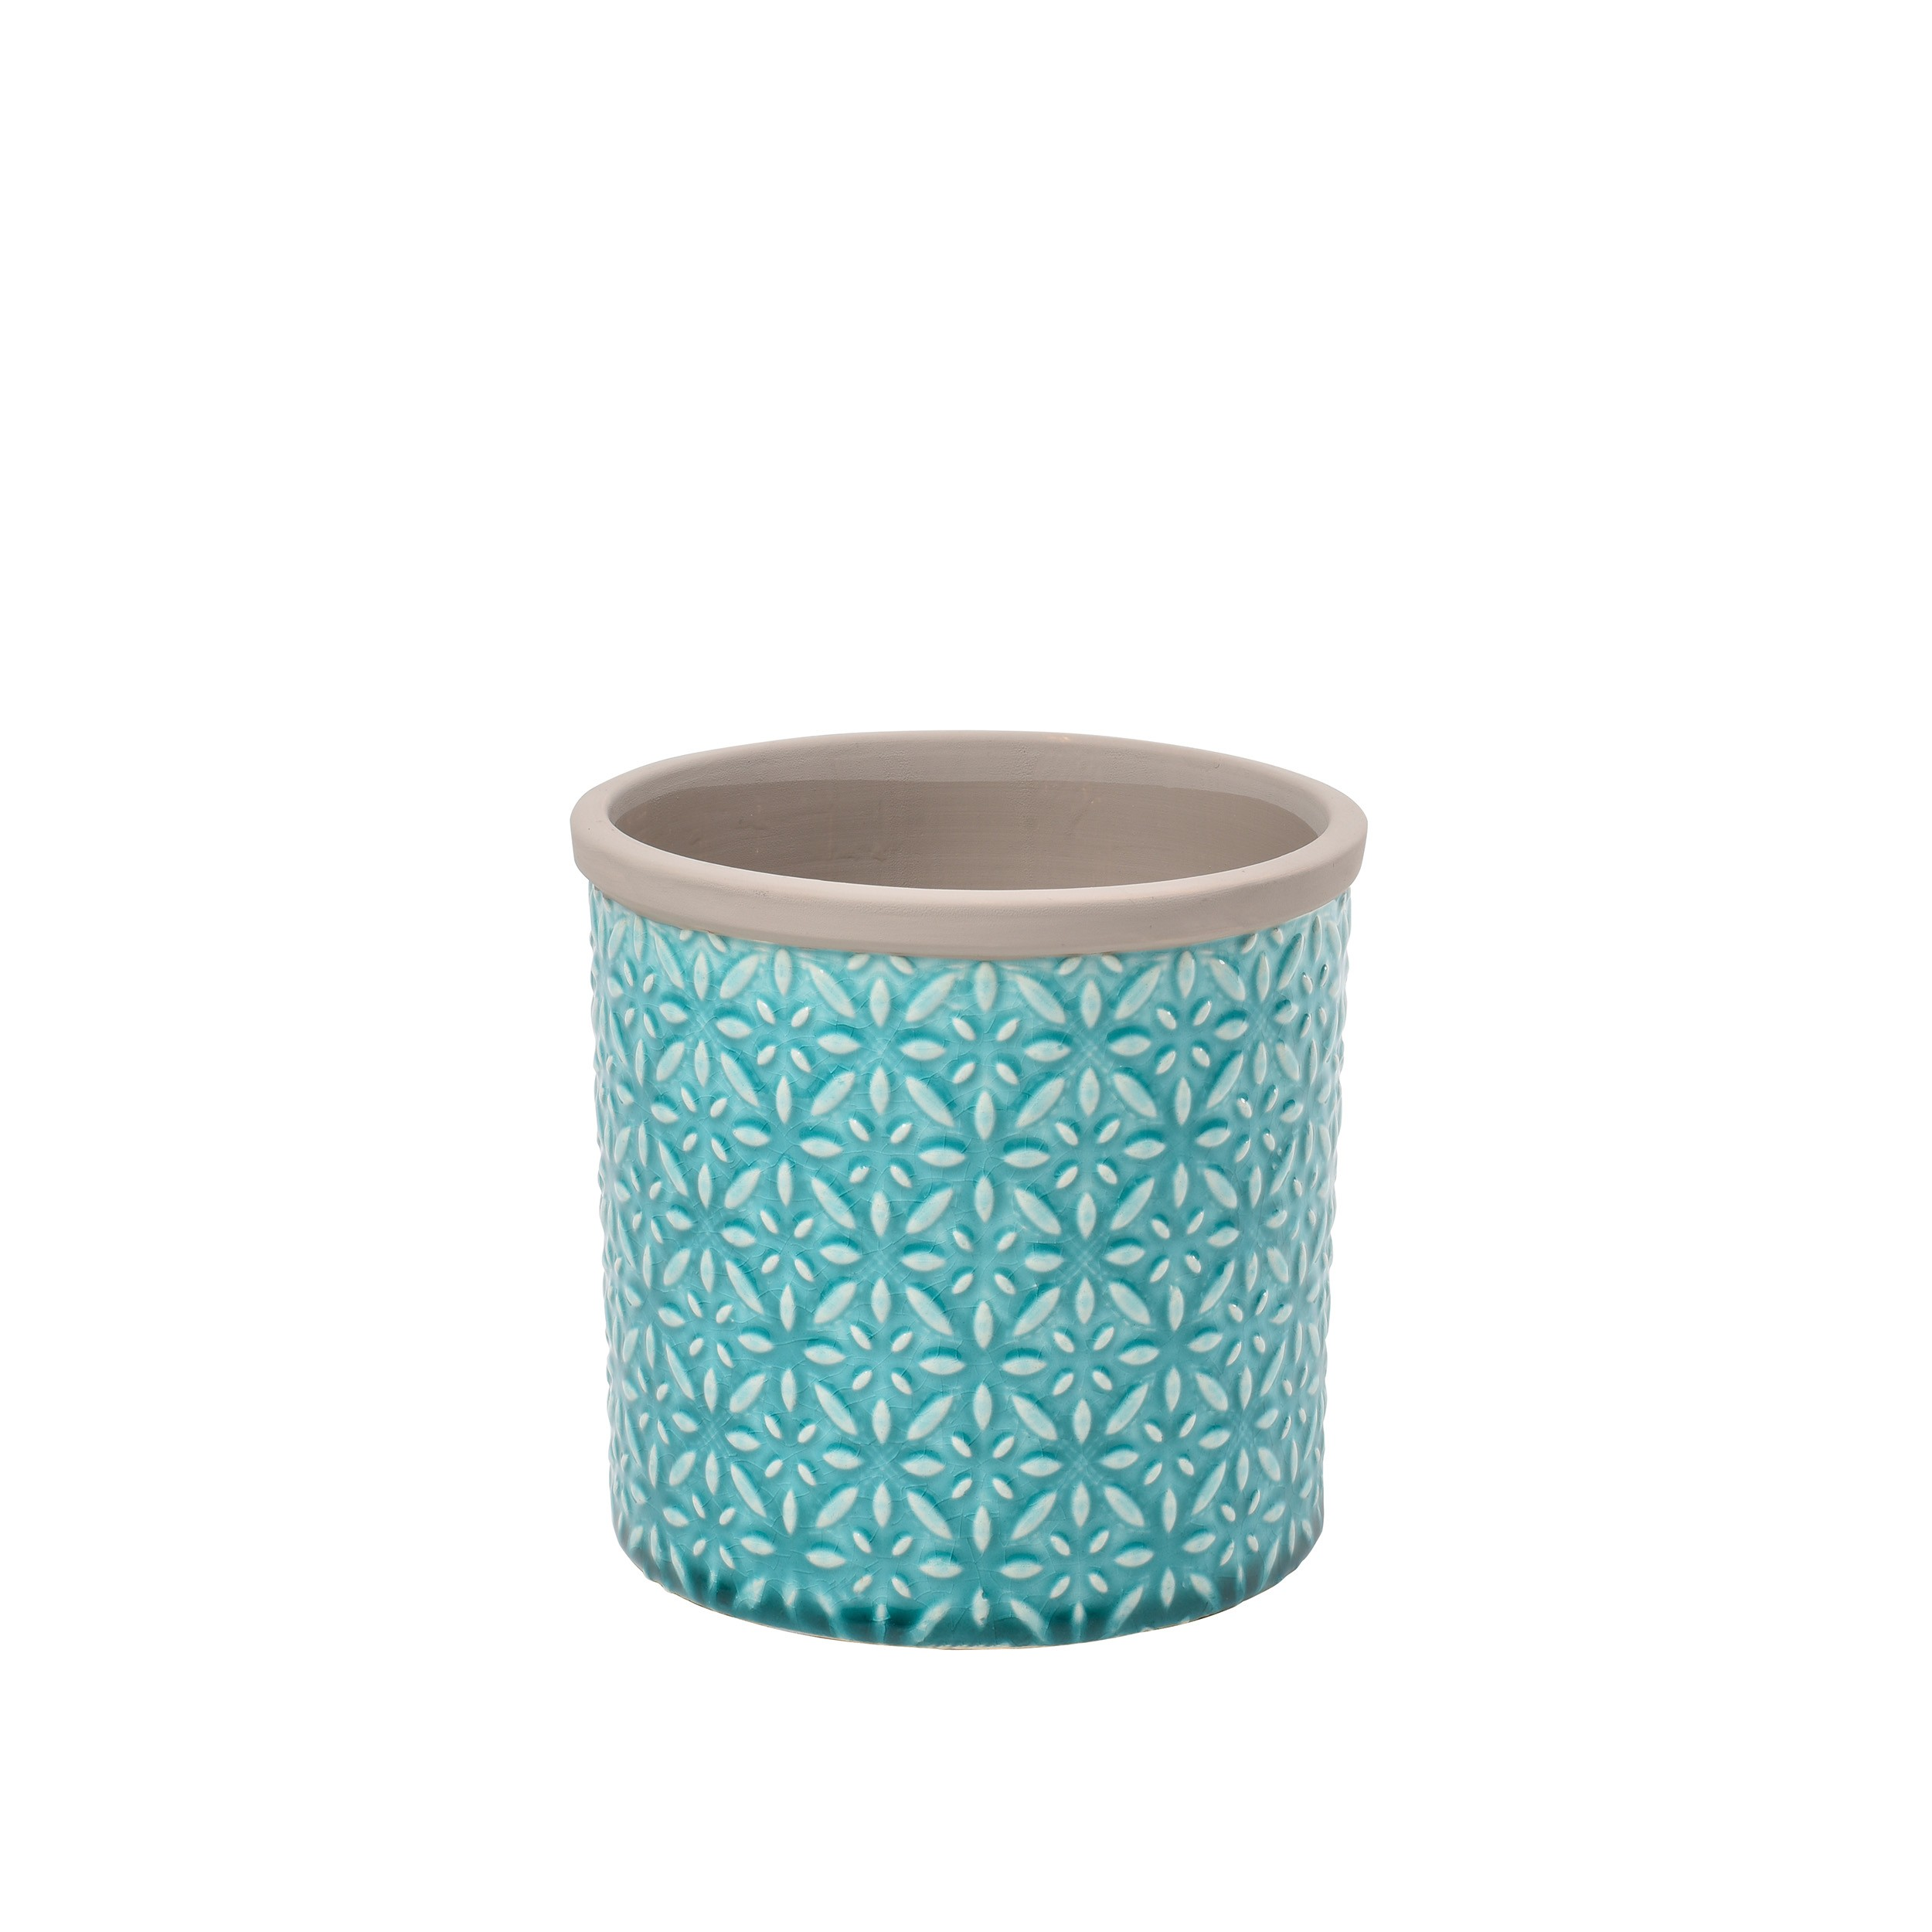 blumentopf tuscany keramik 14cm bertopf pflanztopf rund burgon ball ebay. Black Bedroom Furniture Sets. Home Design Ideas